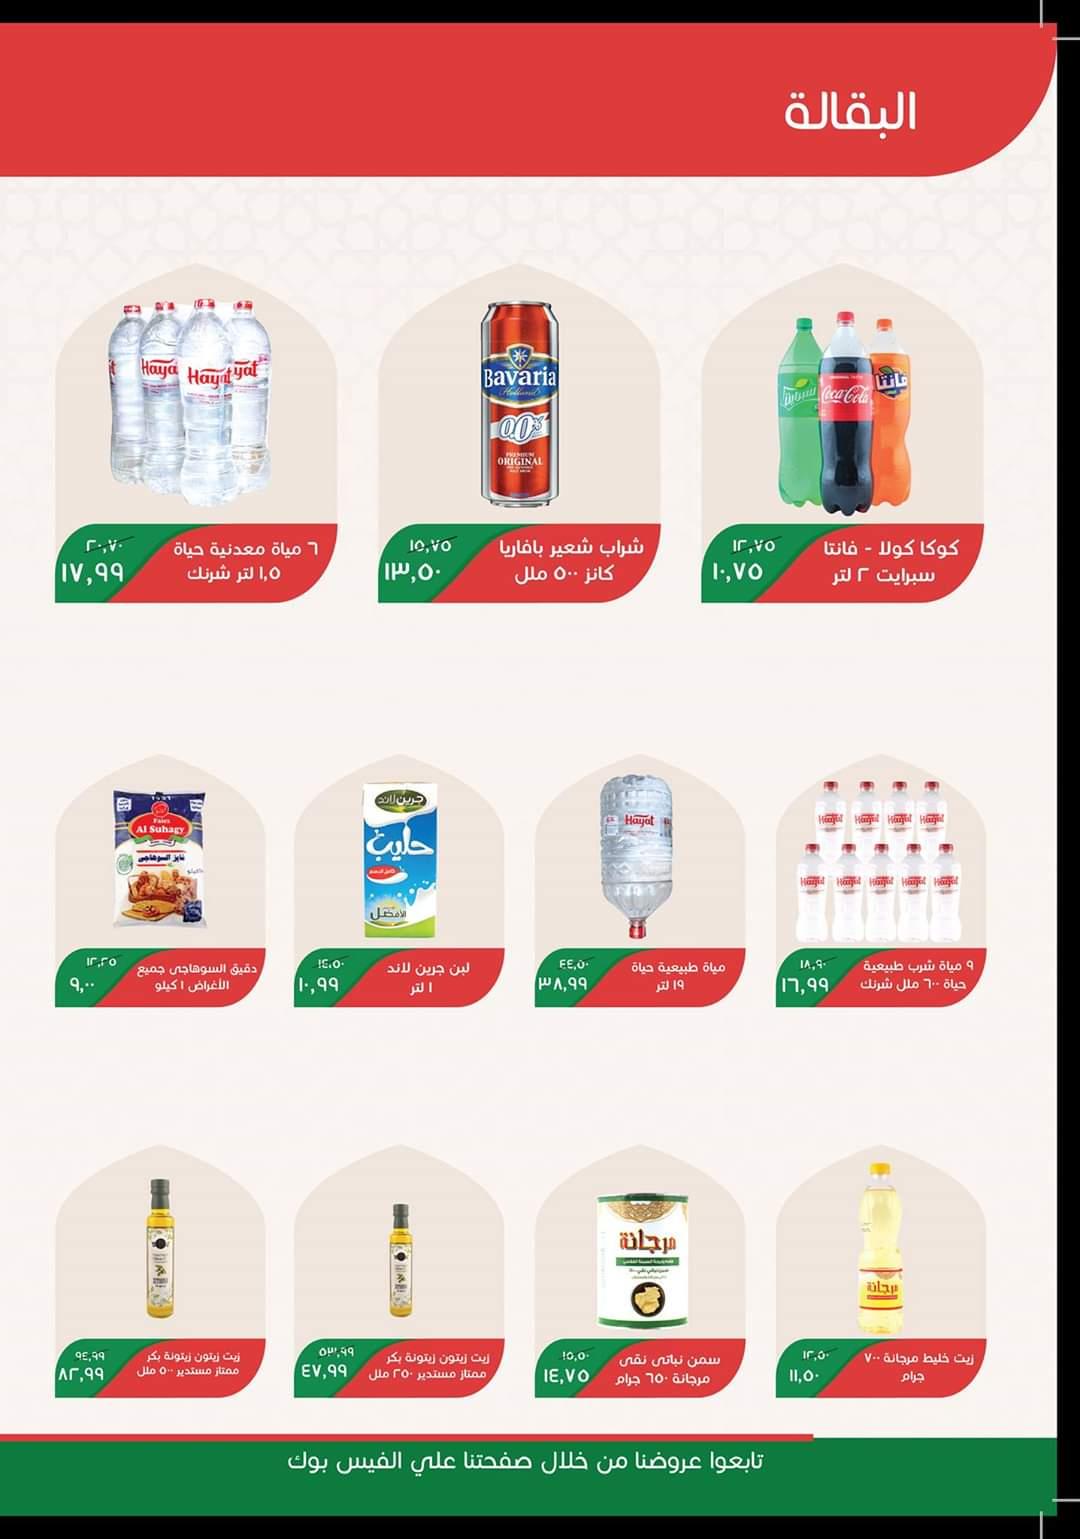 عروض خير زمان عروض رمضان  من 1 مايو حتى 15 مايو 2020